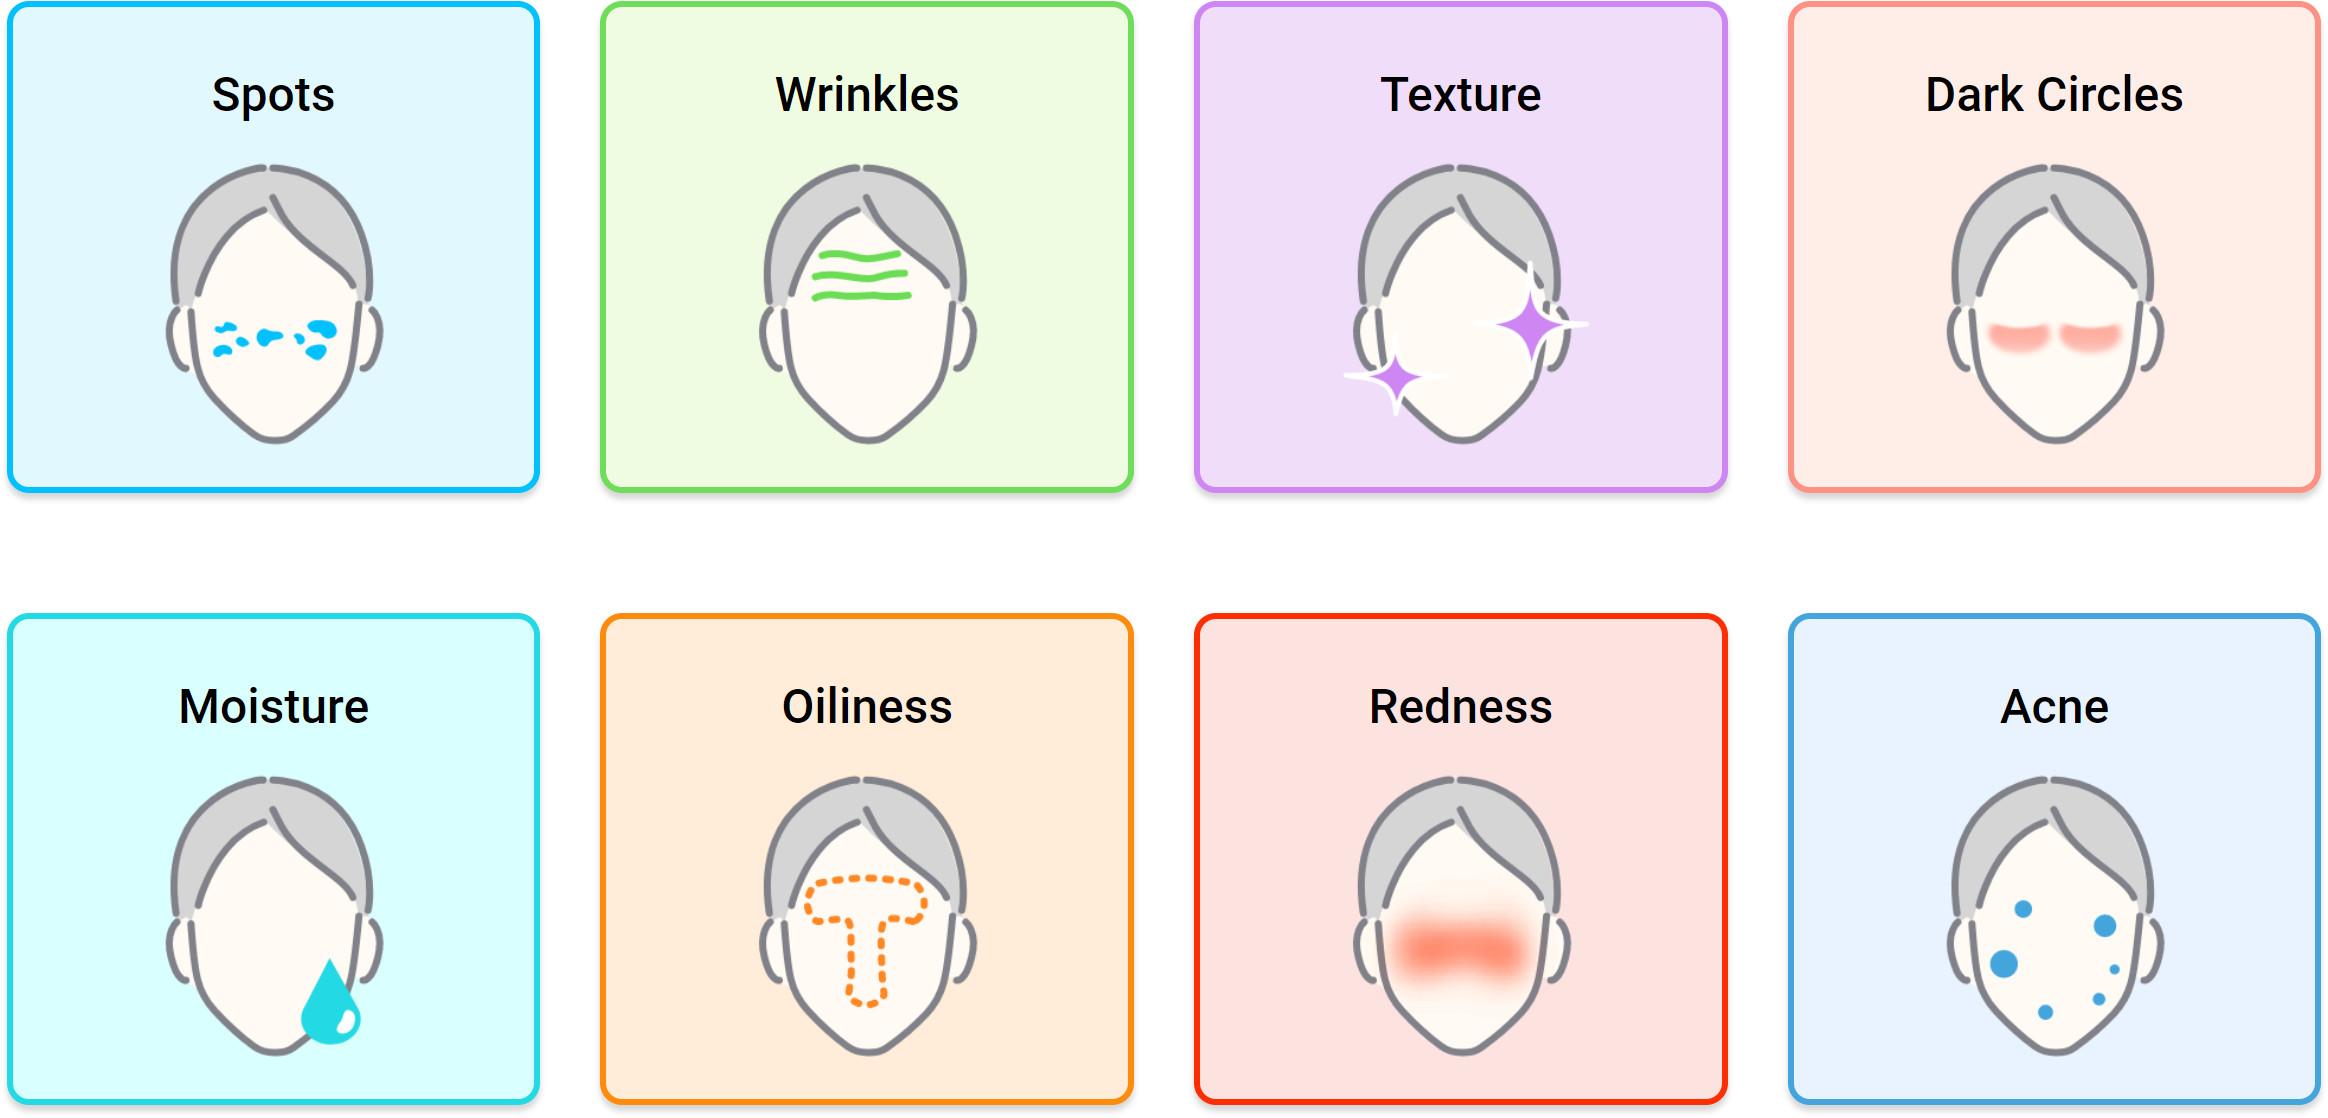 8 types of skin health diagnostics